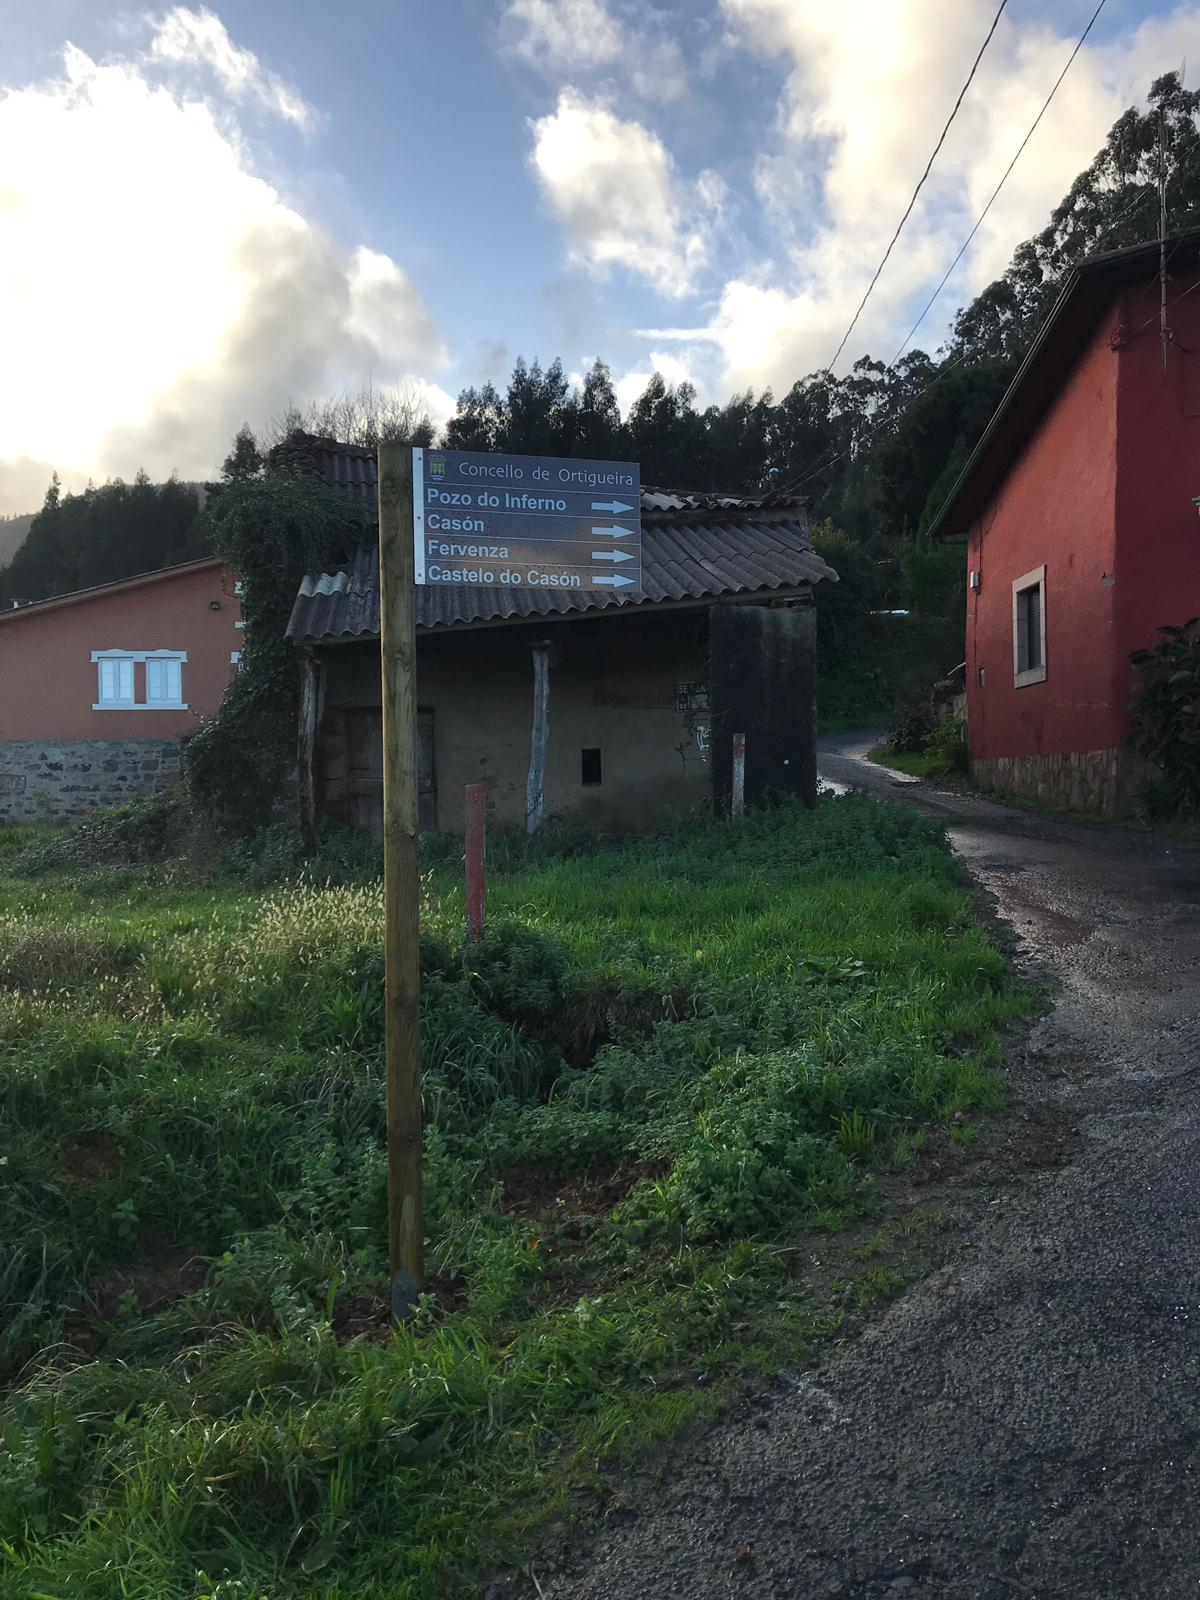 Señalización turística en Galicia